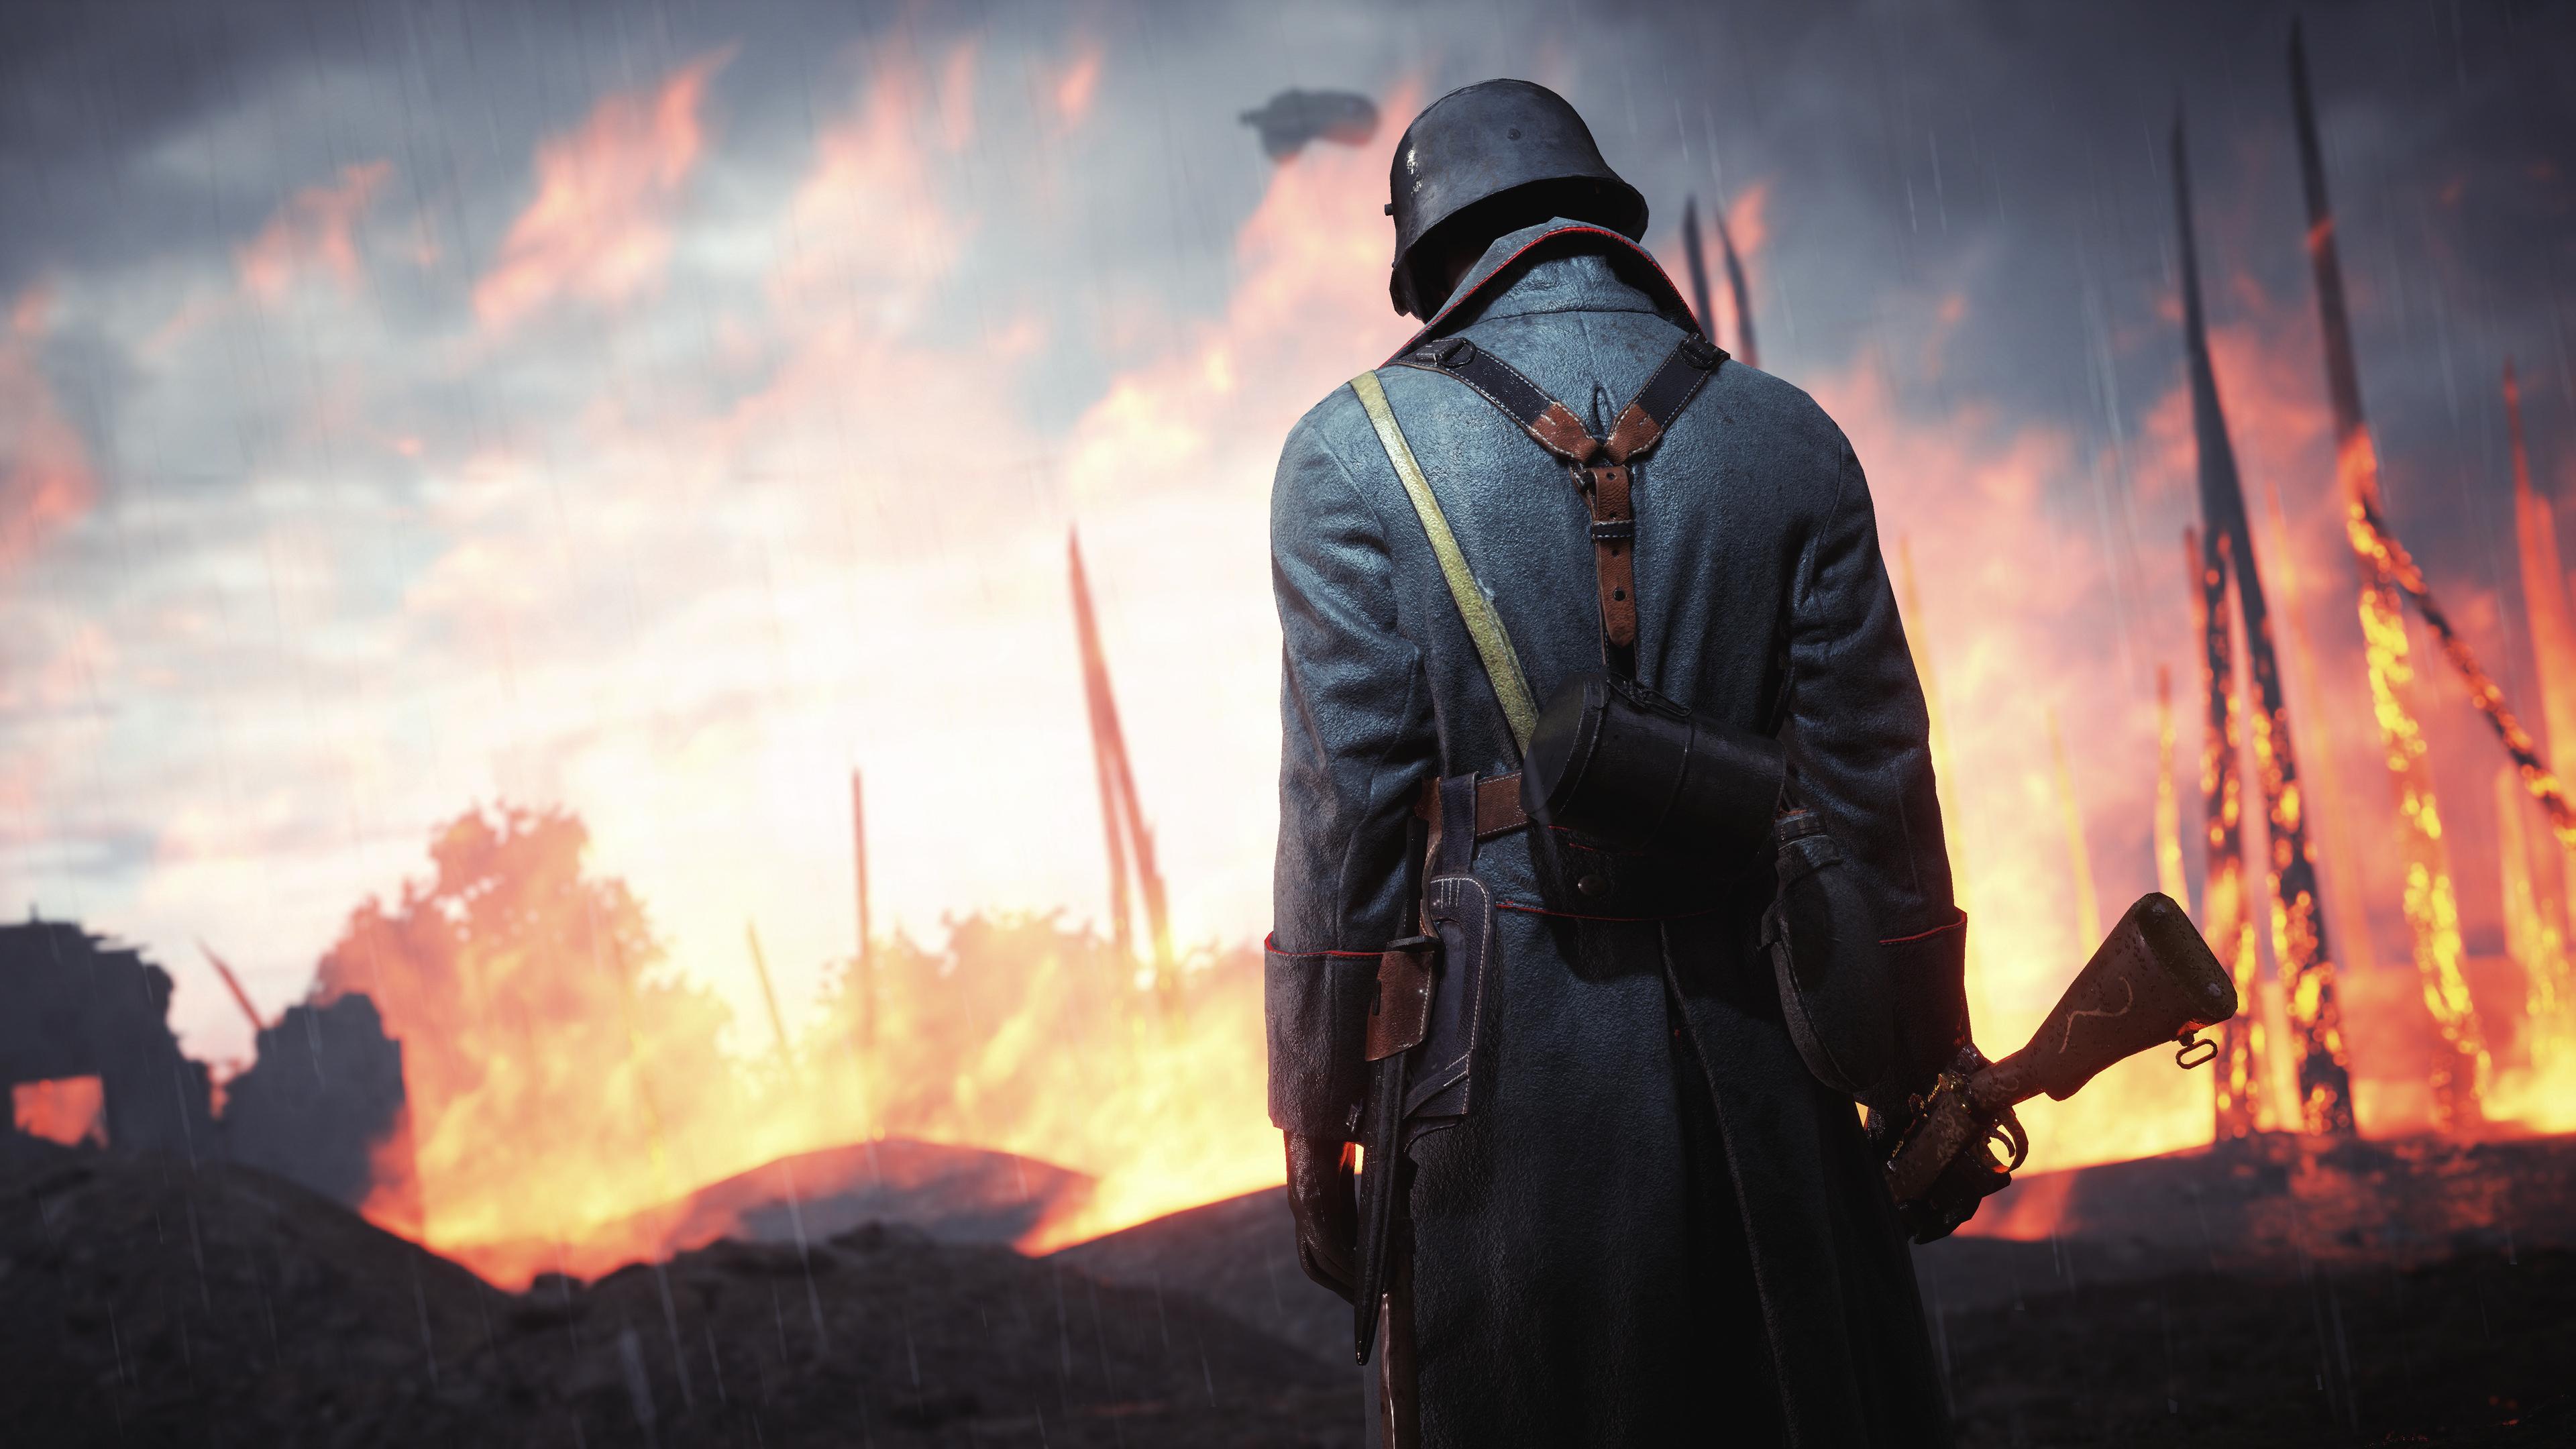 Wallpaper 4k Battlefield 1 Soldier 4k 2019 Games Wallpapers